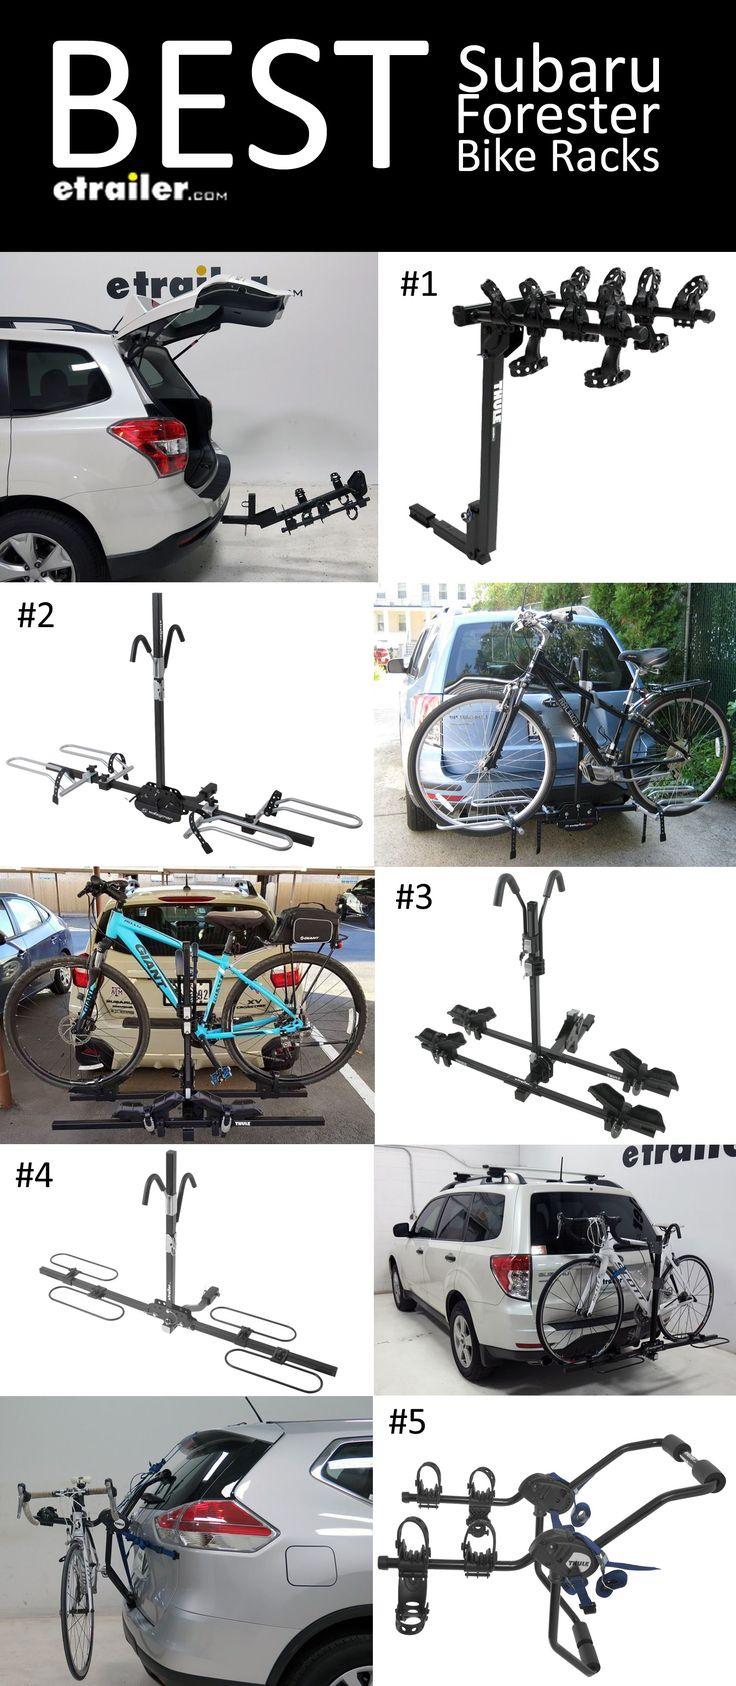 Best Subaru Forester Bike Racks!  - Thule Hitching Post Pro - Folding Tilting 4 Bike Rack w Anti-Sway  - Swagman XTC-2 2-Bike Platform Rack - Thule Doubletrack Platform-Style 2 Bike Rack  - Swagman XC 2-Bike Rack Platform Style - Thule Passage Trunk Mount 2 Bike Carrier